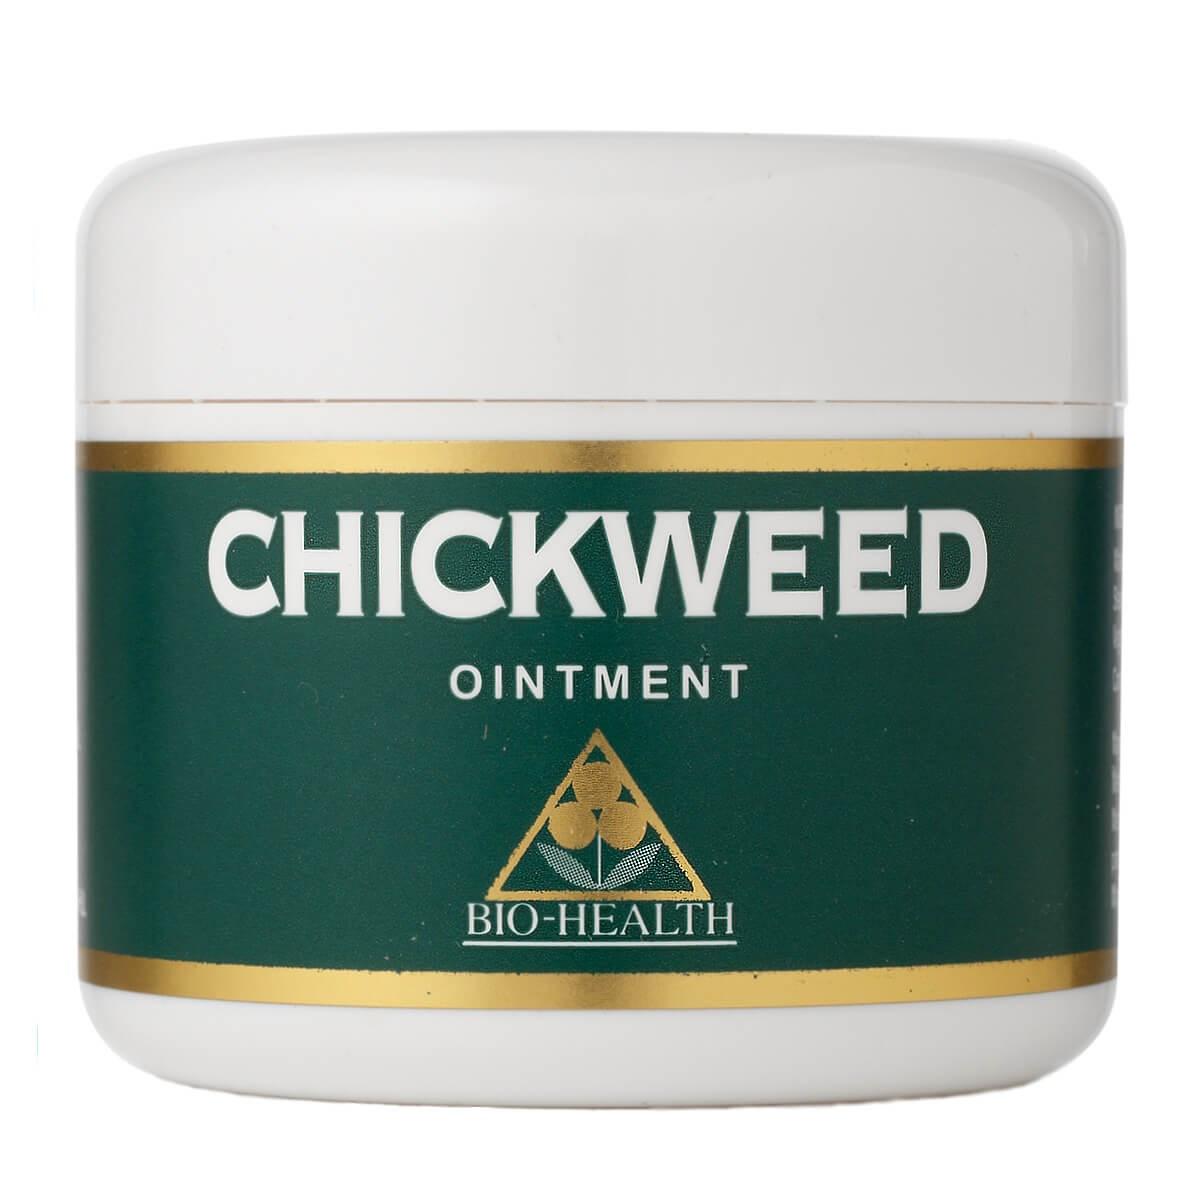 Bio-Health Chickweed Ointment